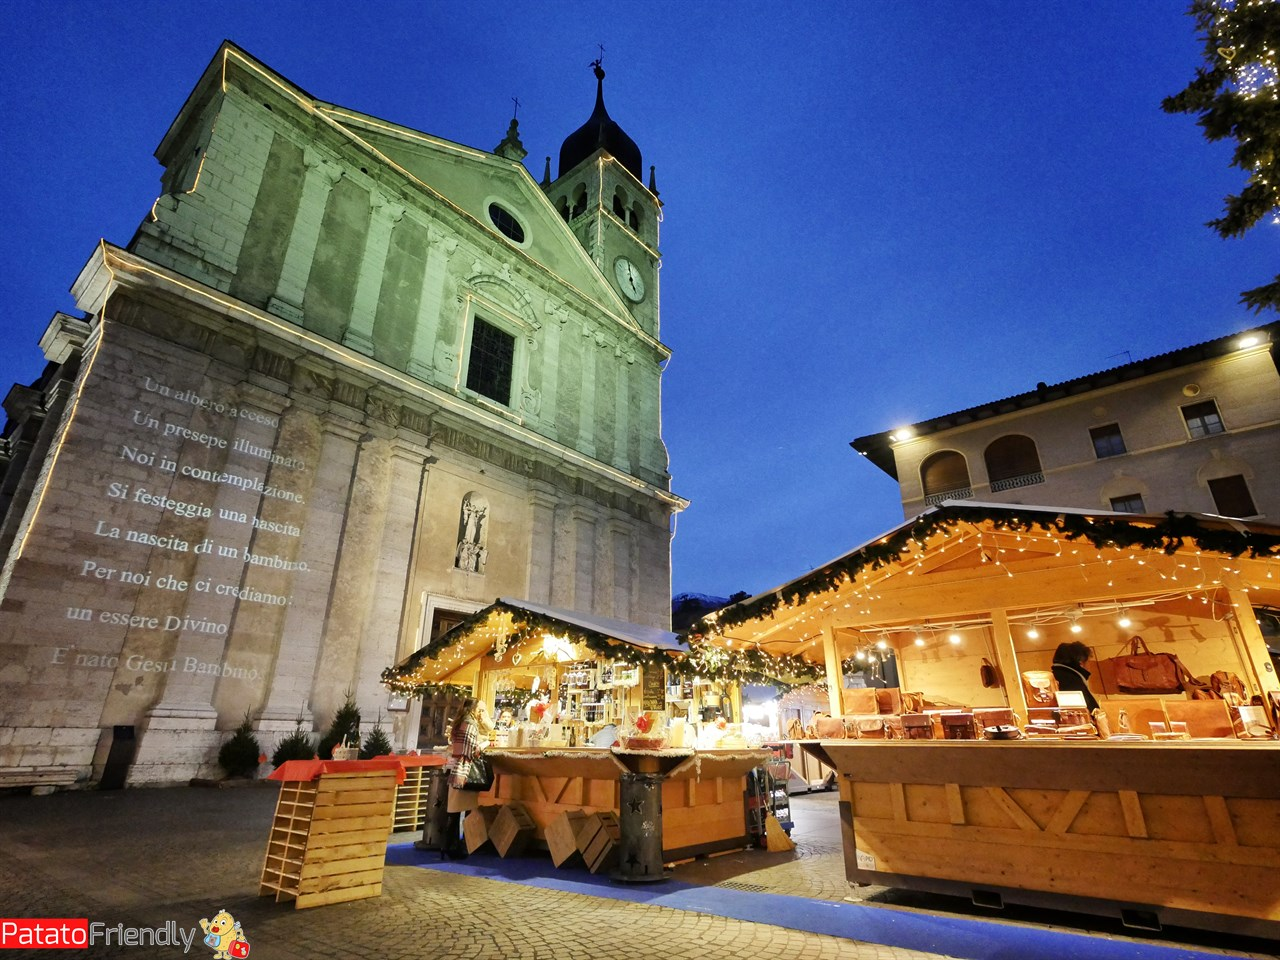 [cml_media_alt id='13025']Il mercatino di Natale di Arco[/cml_media_alt]